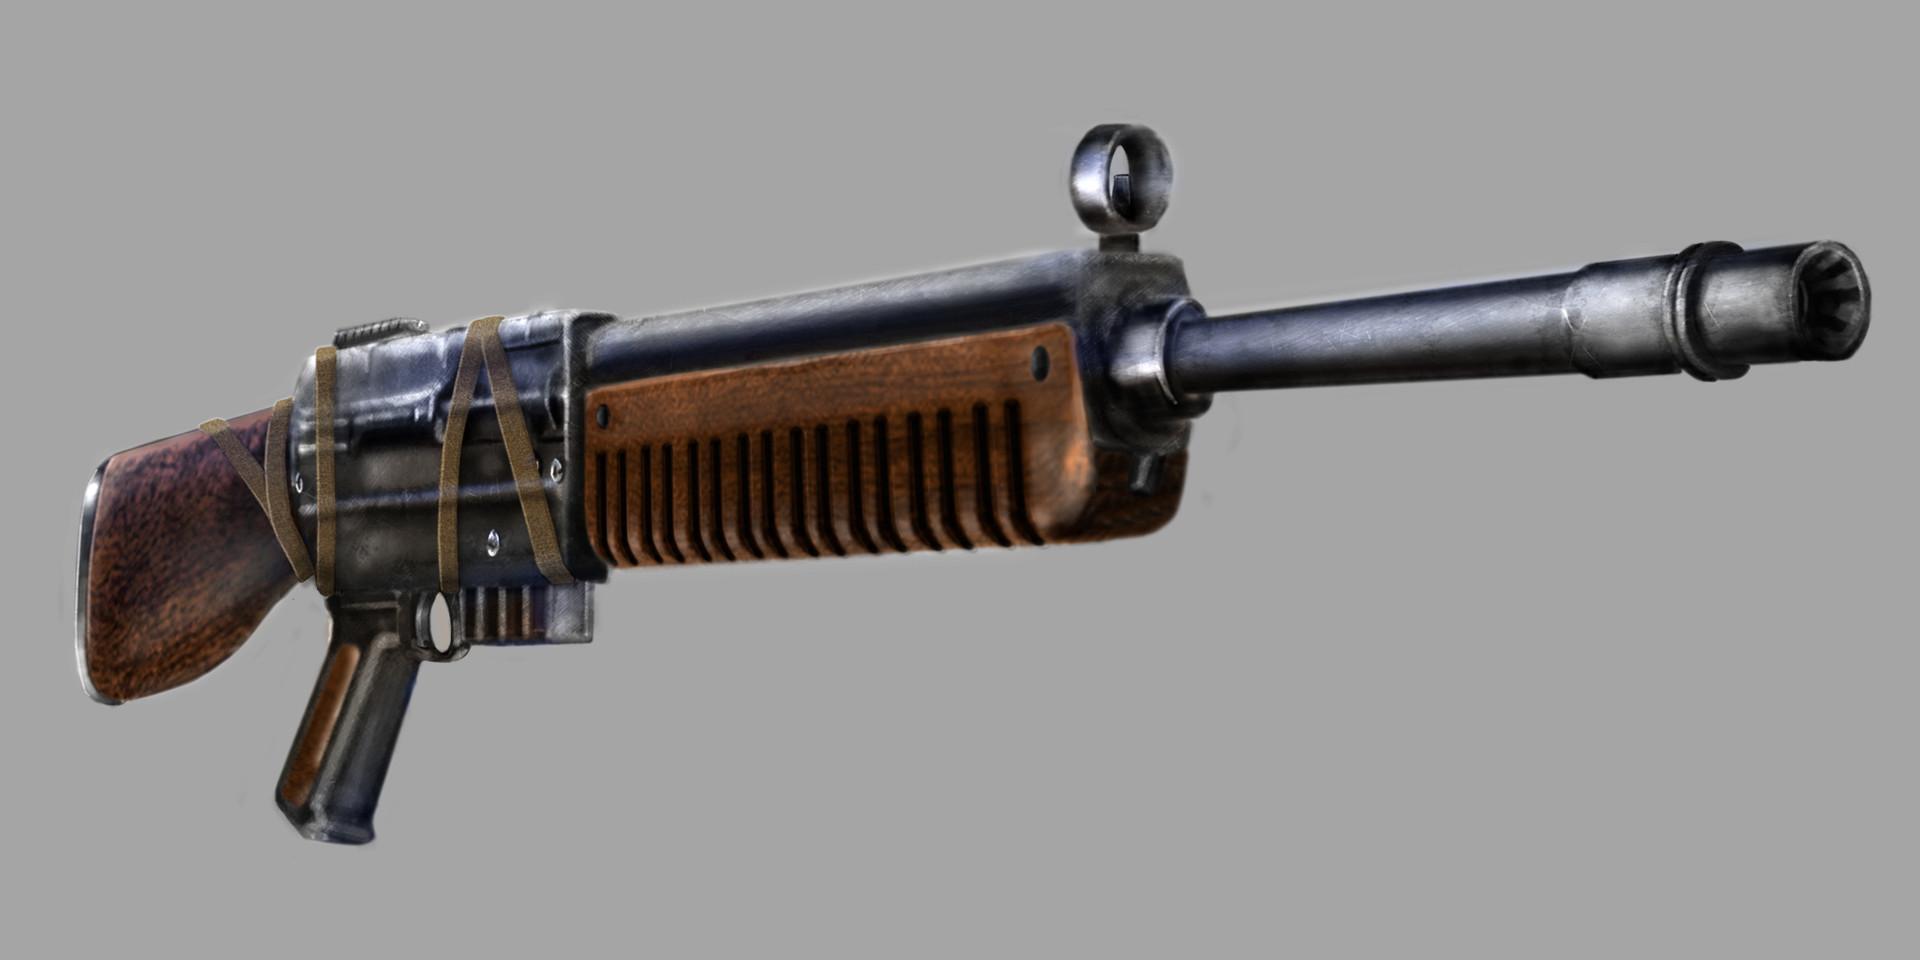 Anıl İşbilir Fallout Hunting Rifle